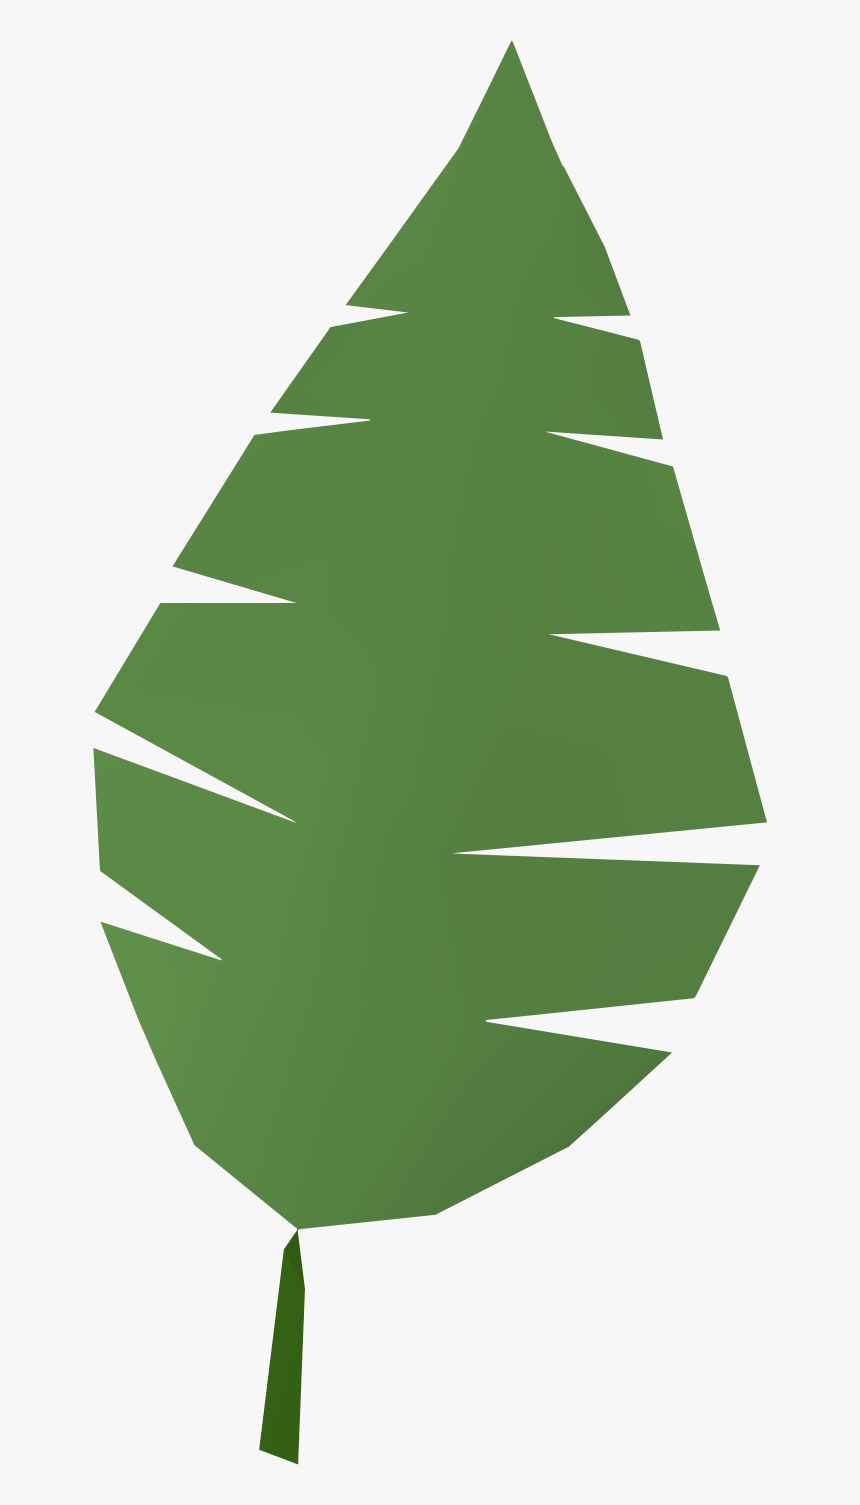 Palm Tree Leaf Cartoon, HD Png Download, Free Download